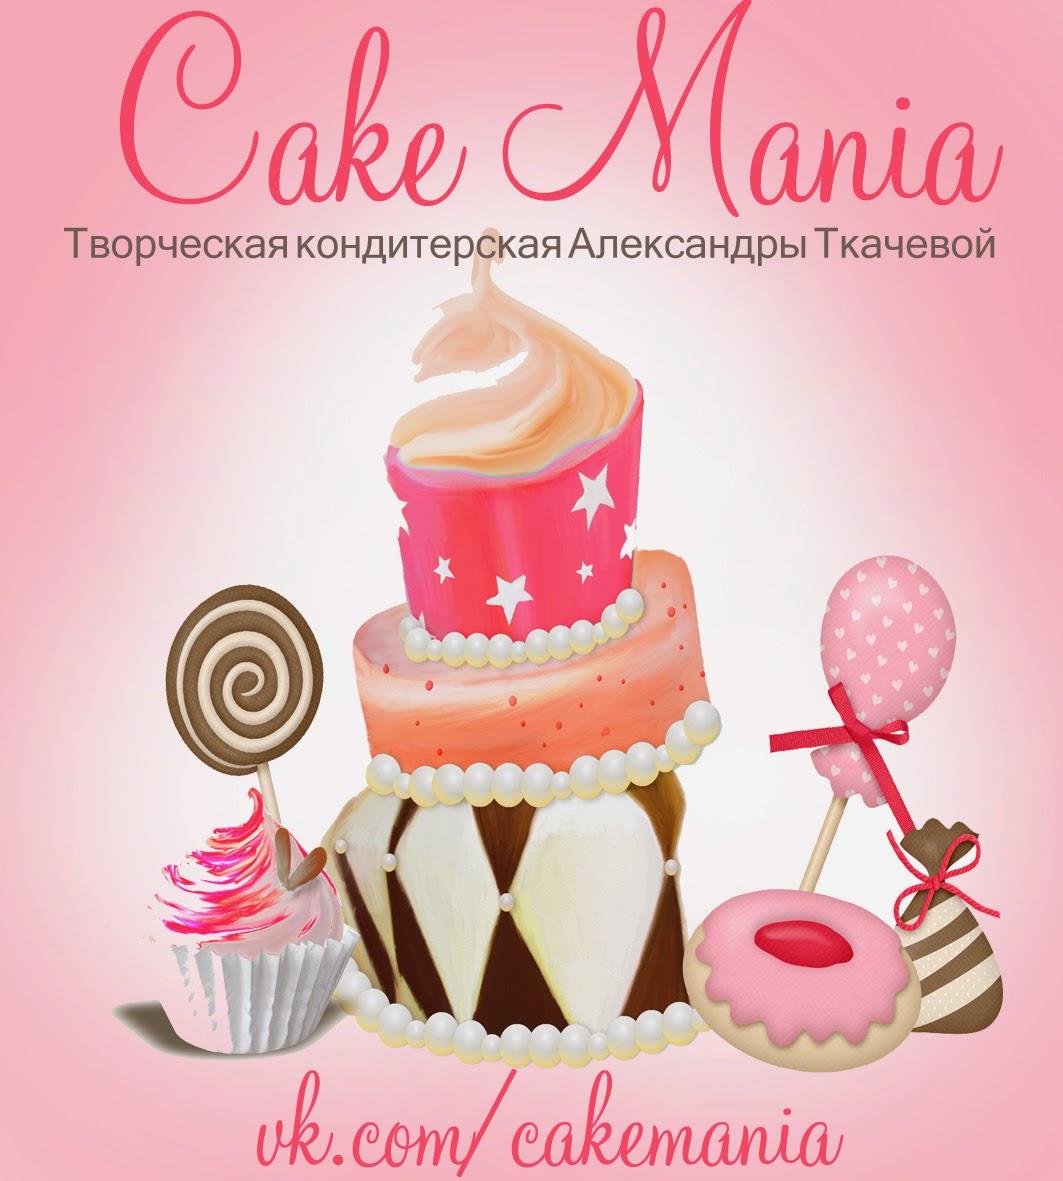 Cake Design by Aleksandra Tkacheva